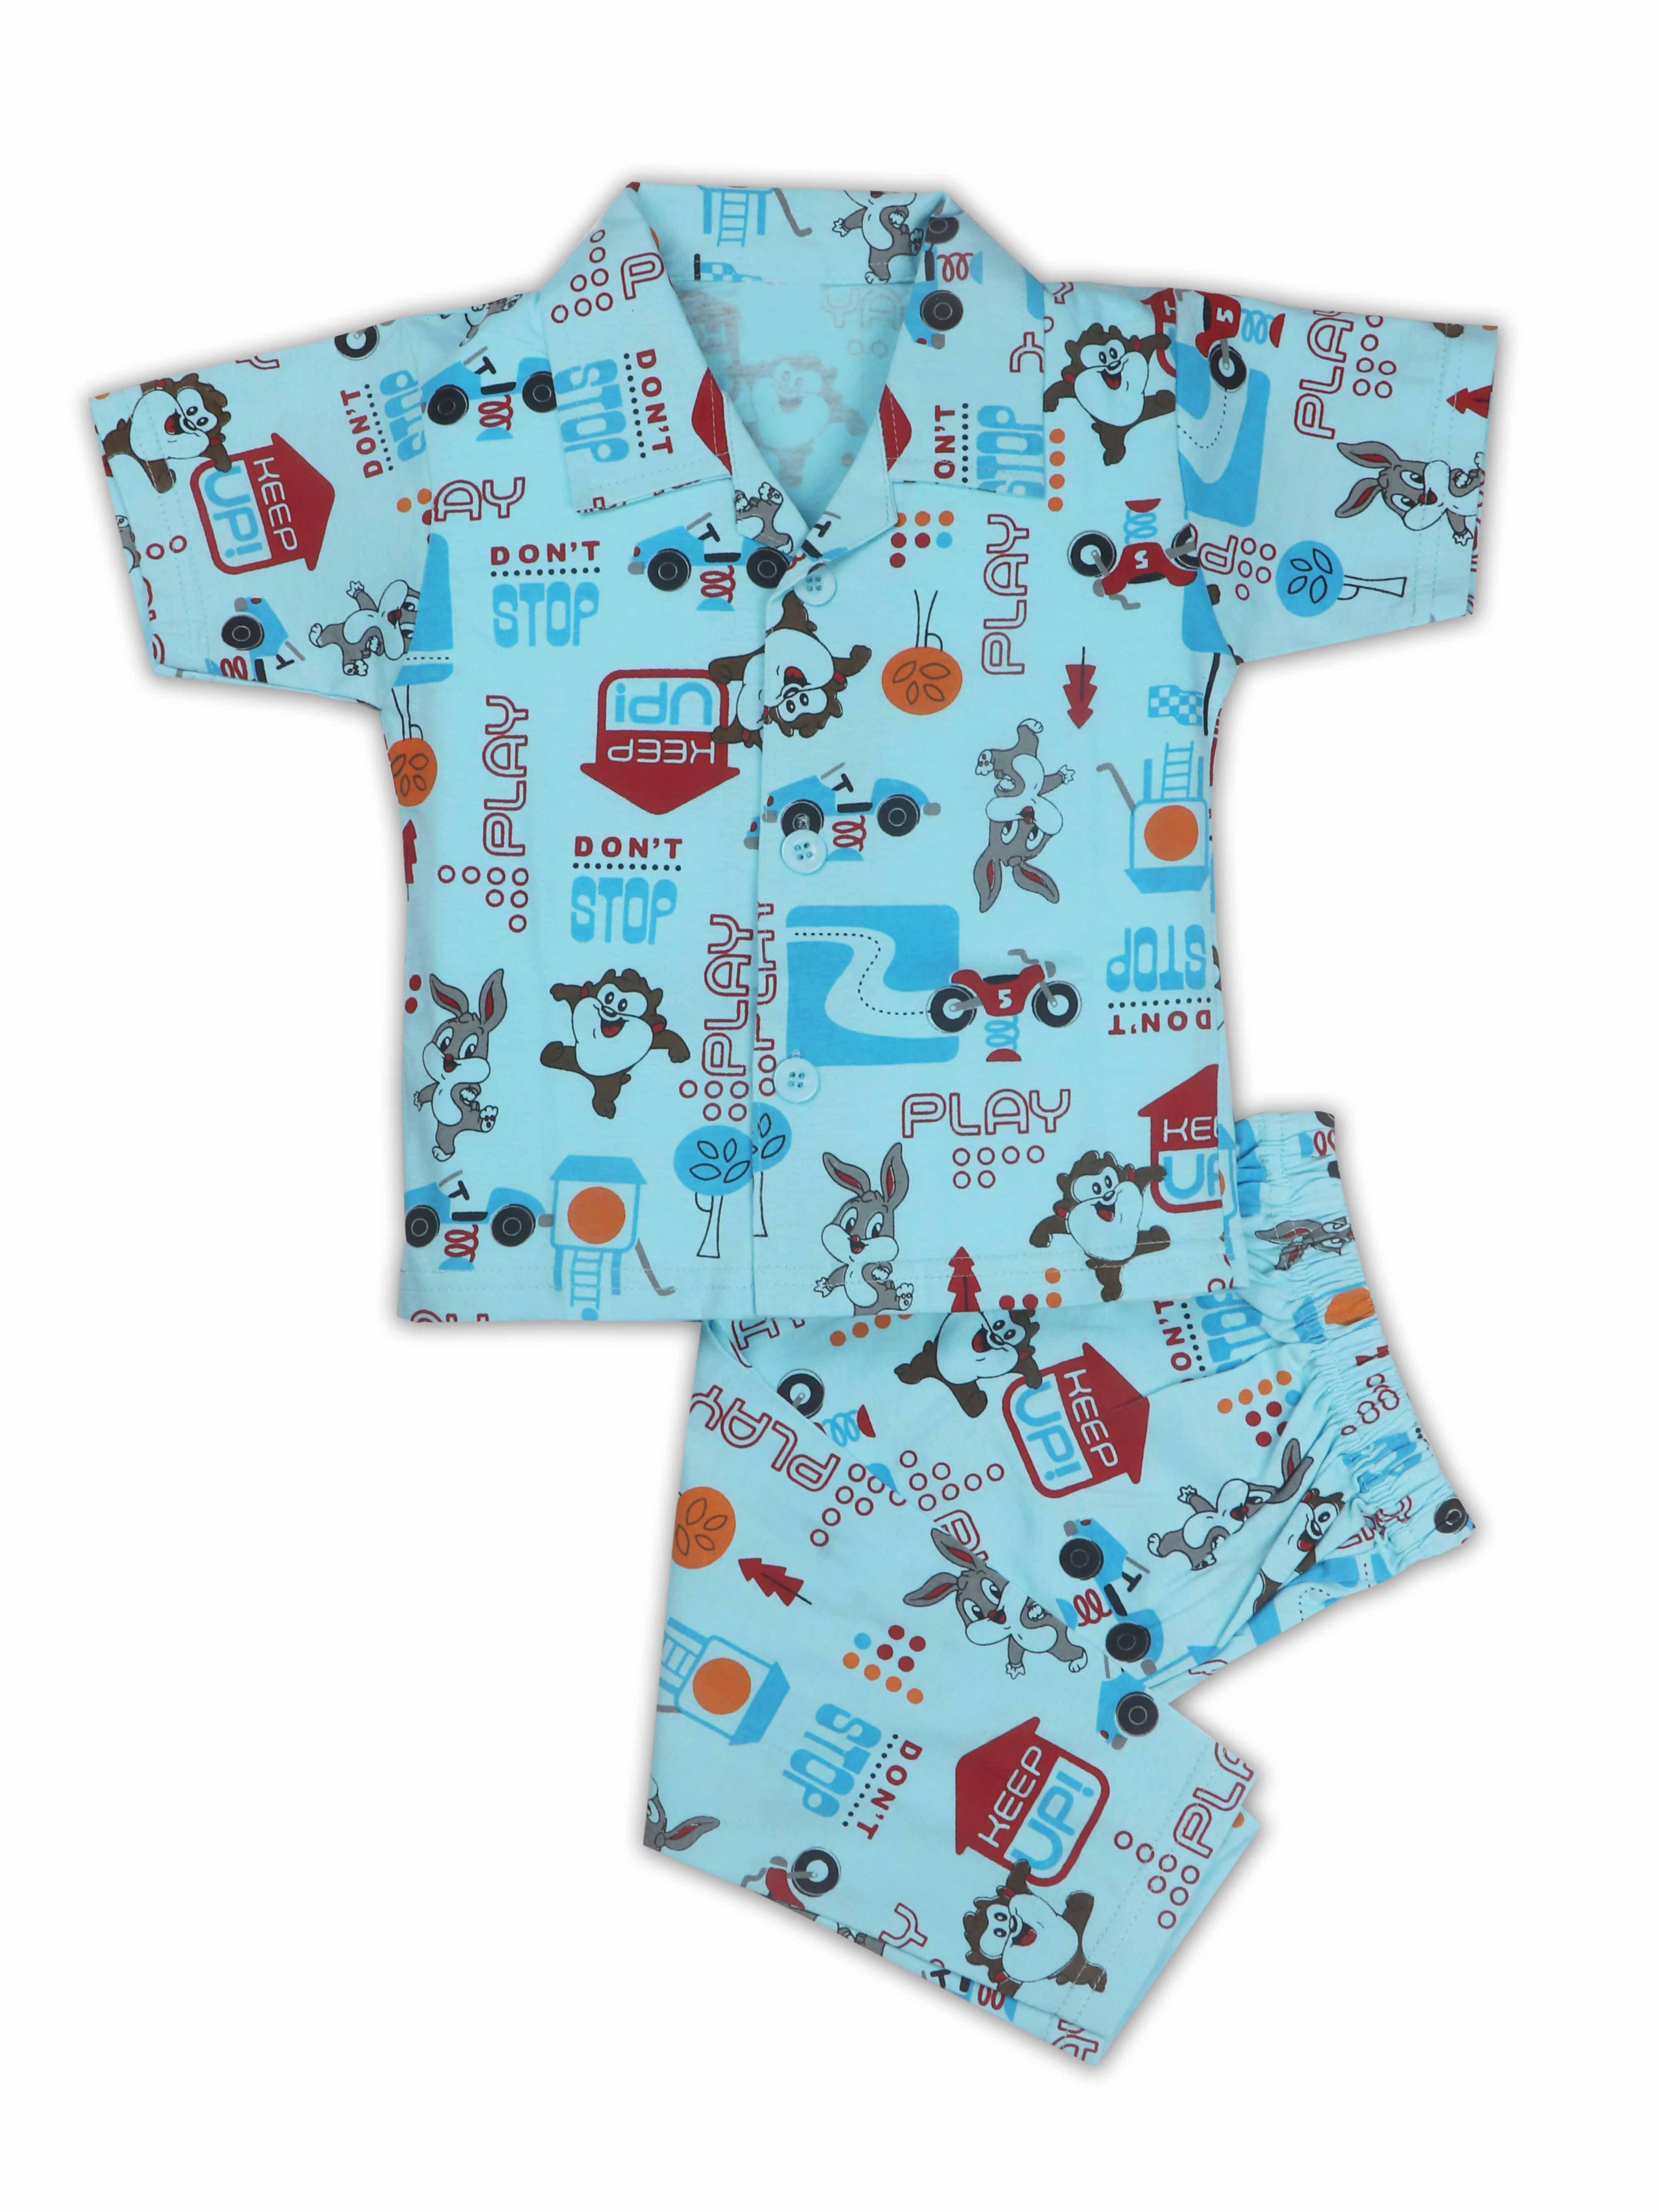 AAAKAR | AAAKAR Full Sleeves Night Suit All Over Print Sports - Blue